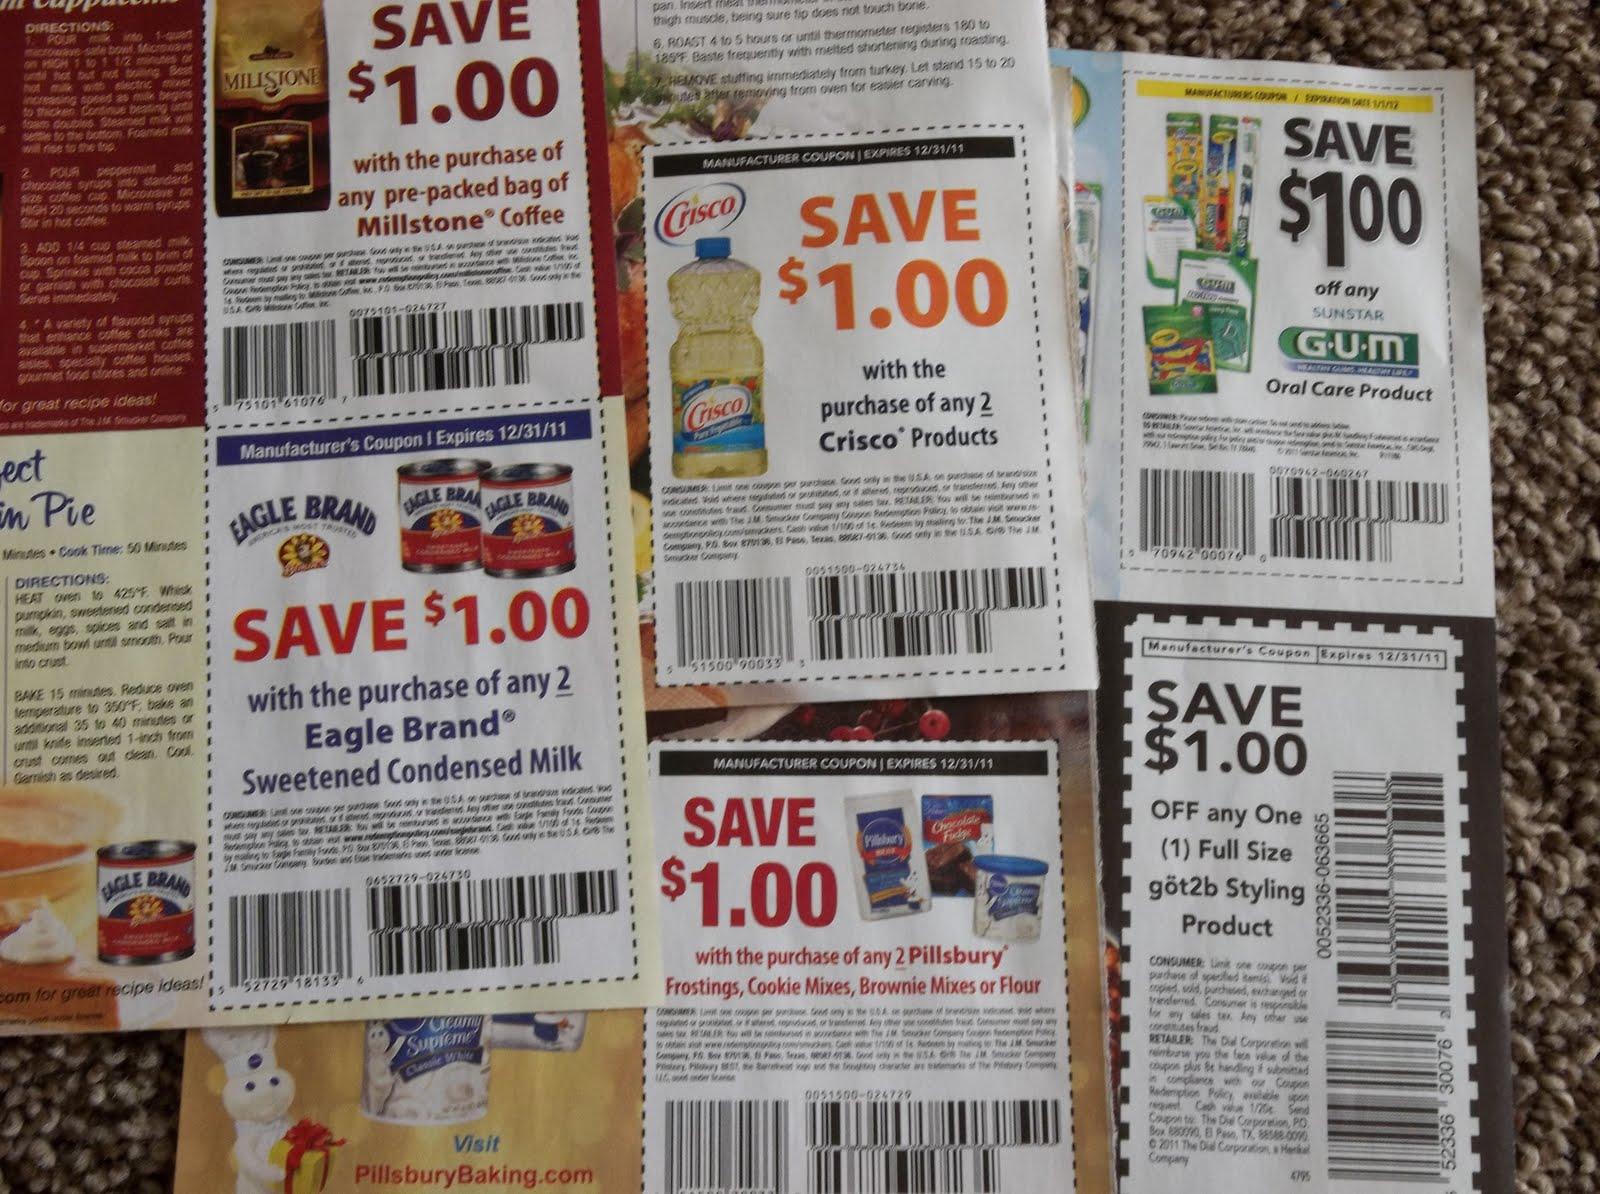 image regarding Scheels Coupons Printable identify Scheels discount codes printable 2018 : Dominos pizza coupon codes acquire